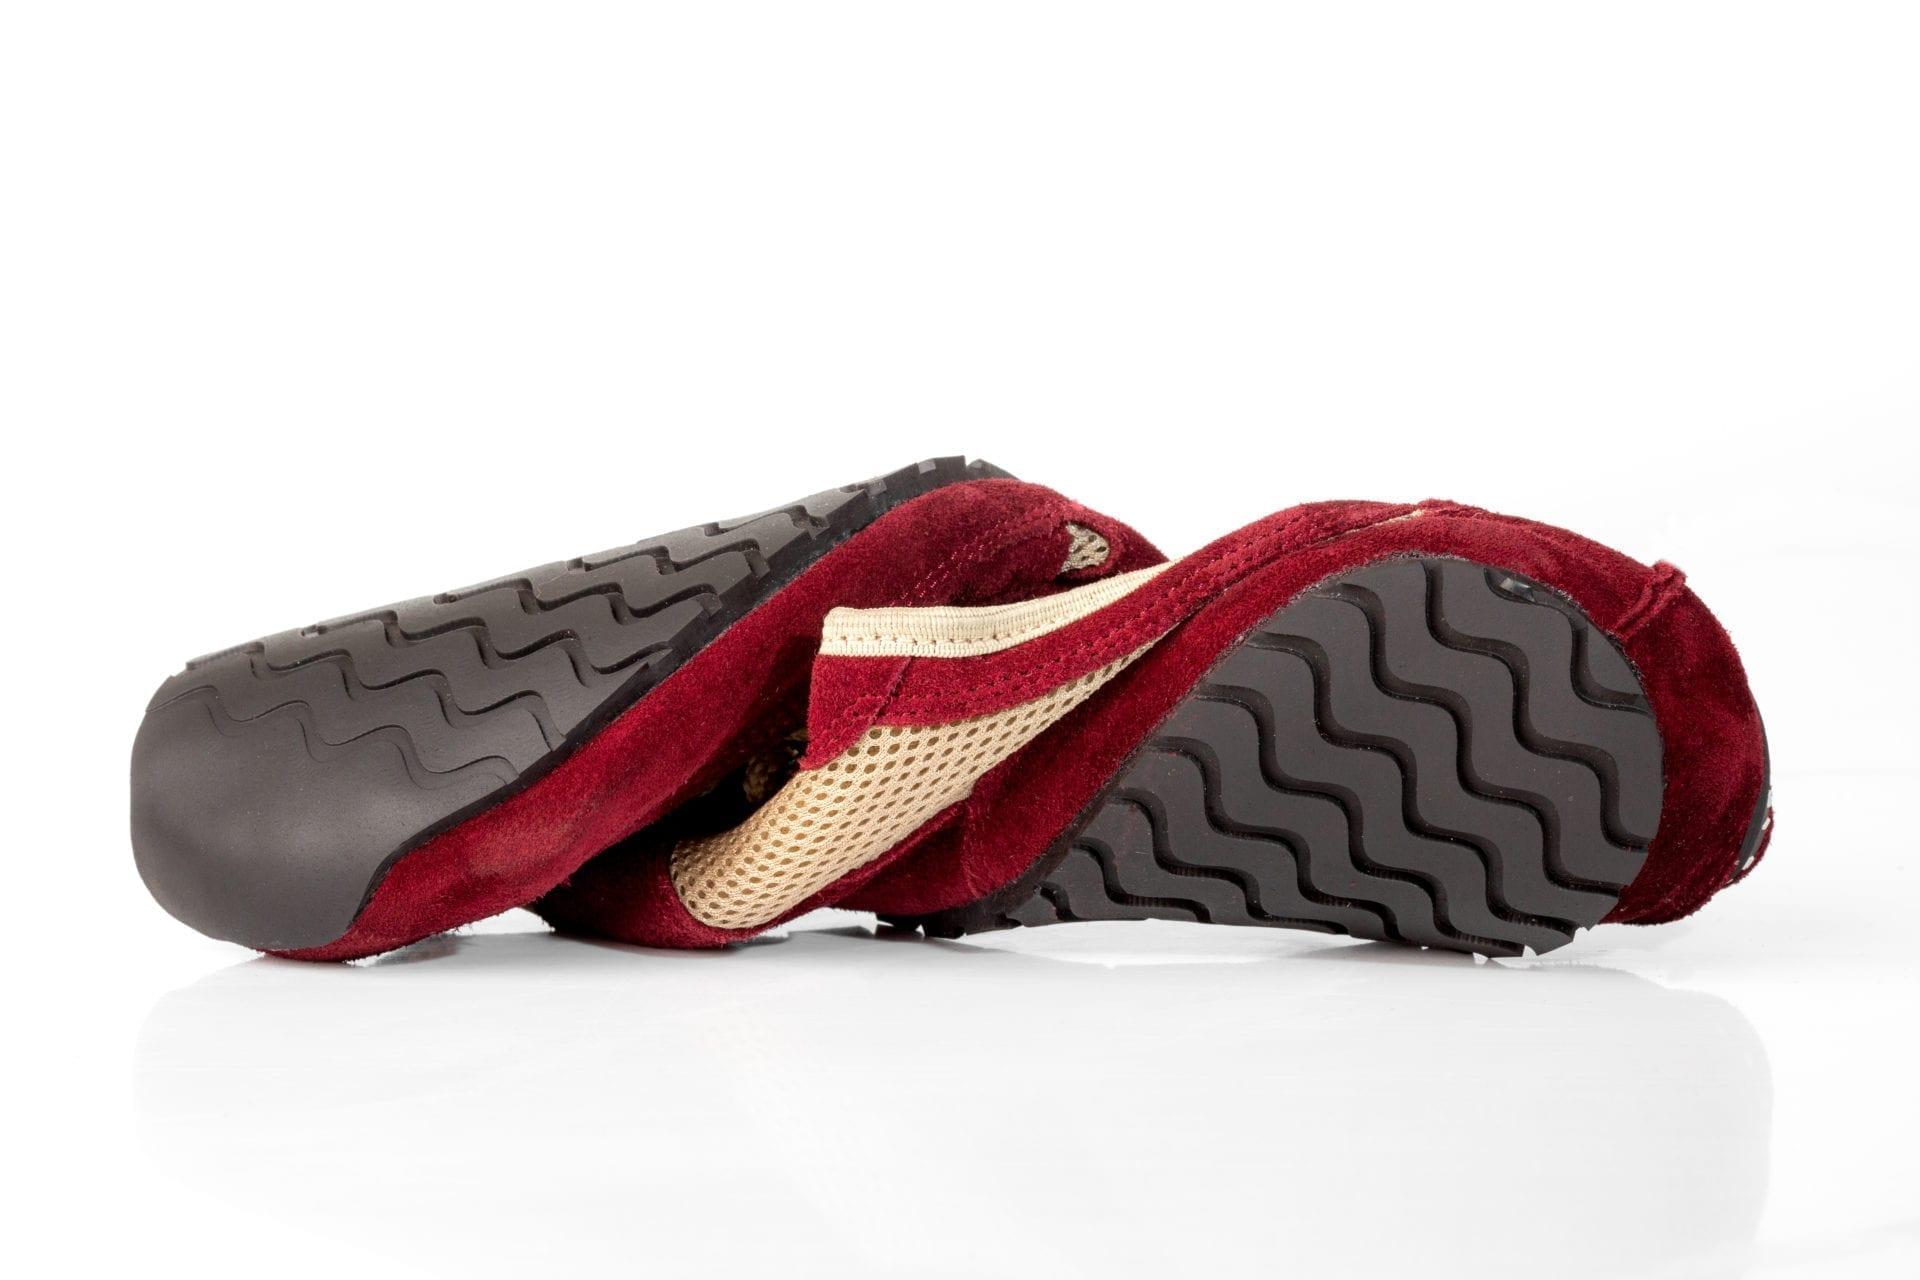 Magical Shoes EXPLORER – FRUITY CLARET BAREFOOT SHOES picture 6